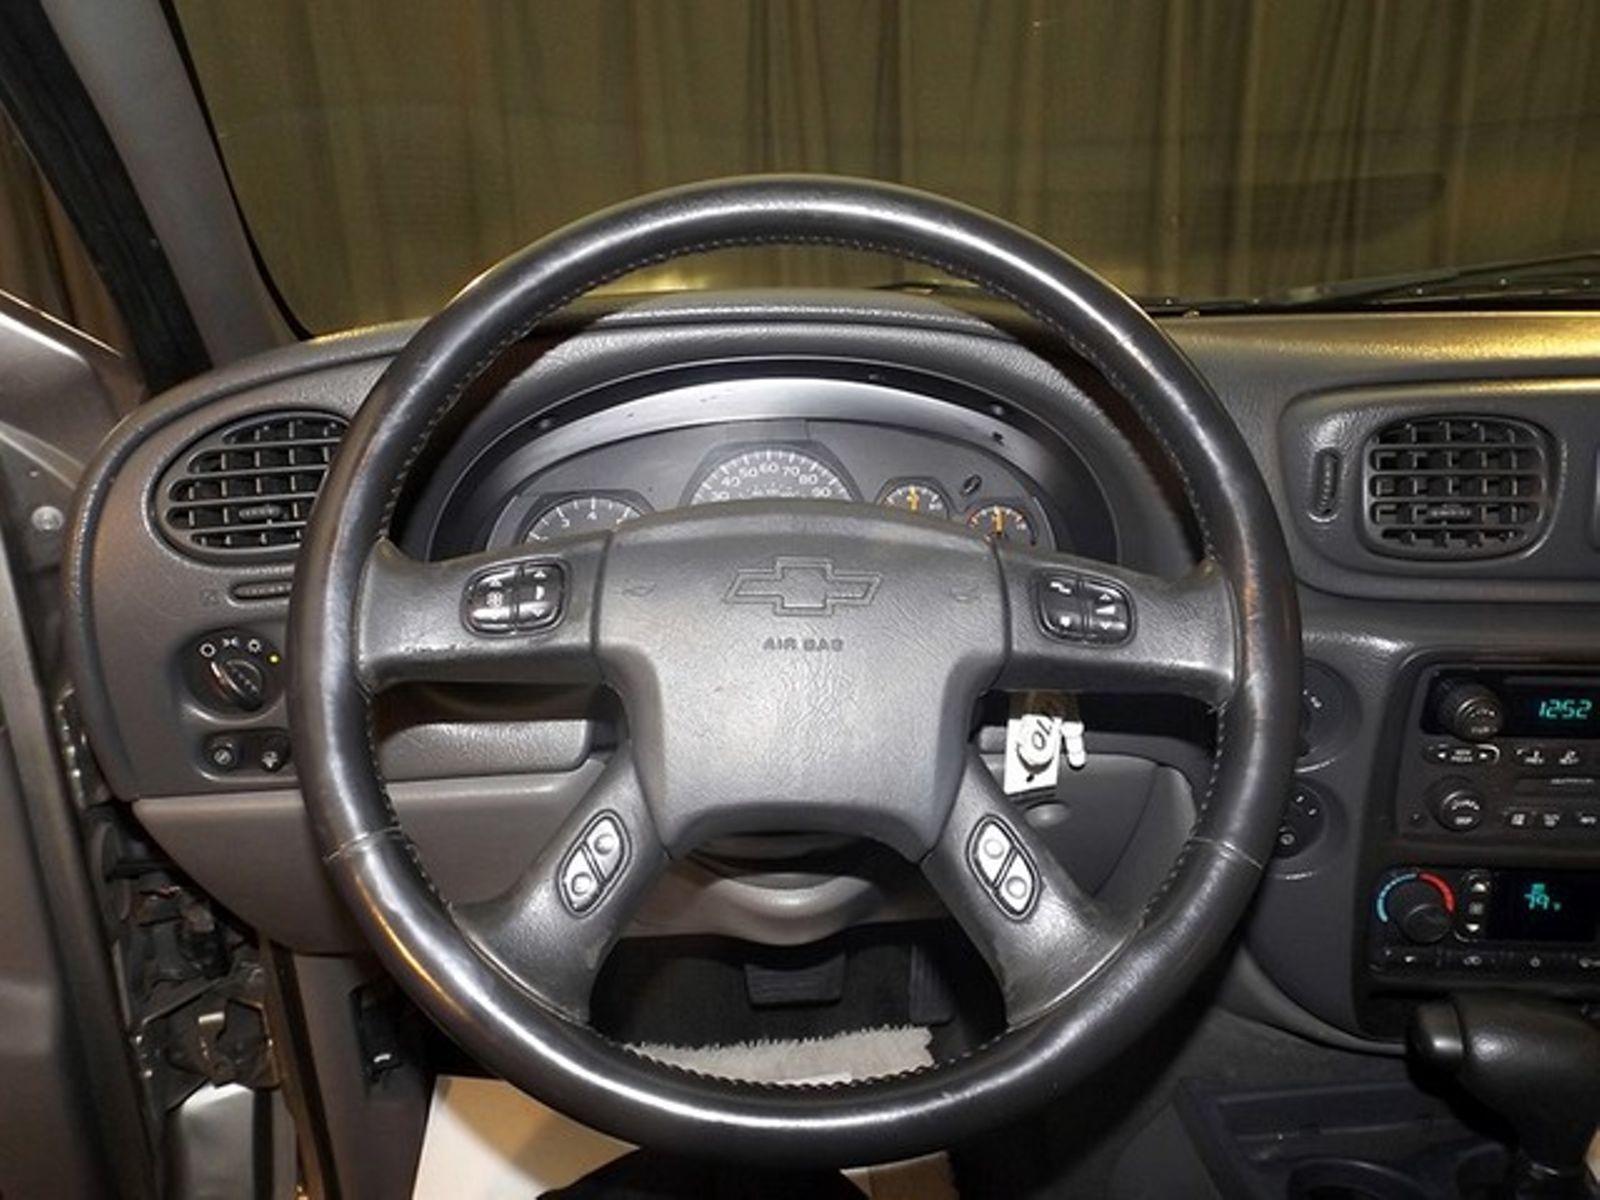 2002 Chevrolet TrailBlazer LTZ As low as 799 DOWN city Ohio North